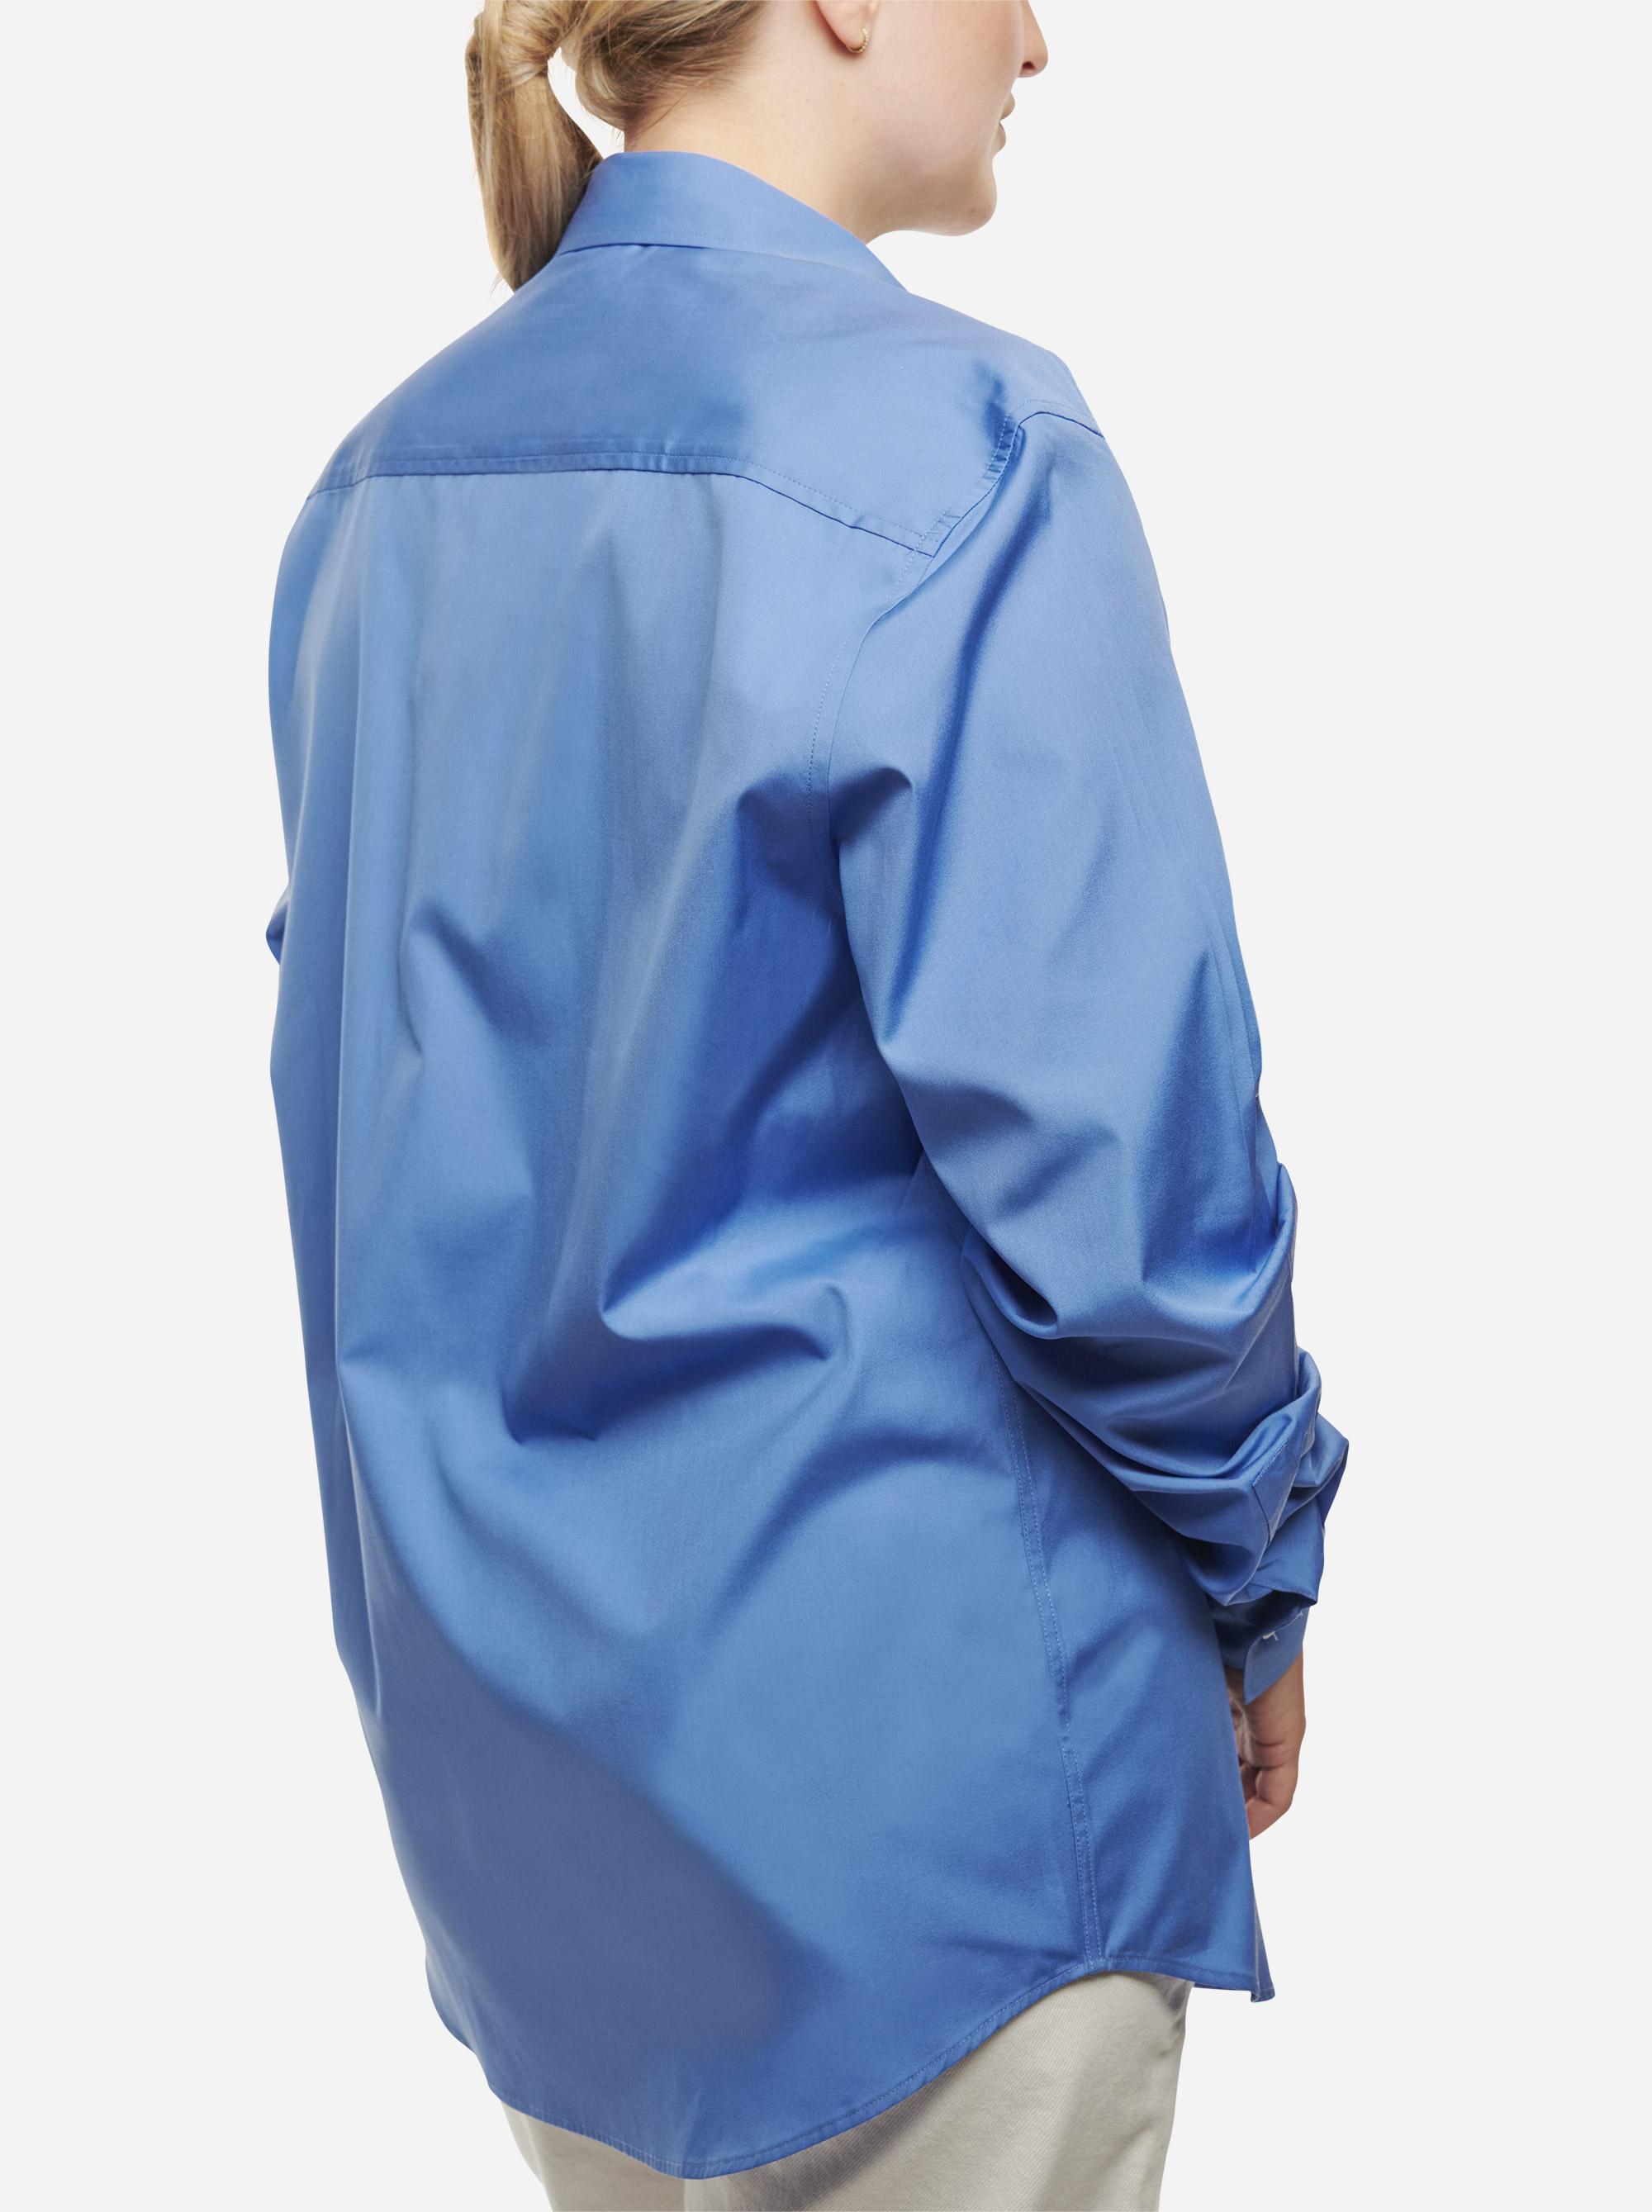 Teym-Shirt-Blue-women-mens-3